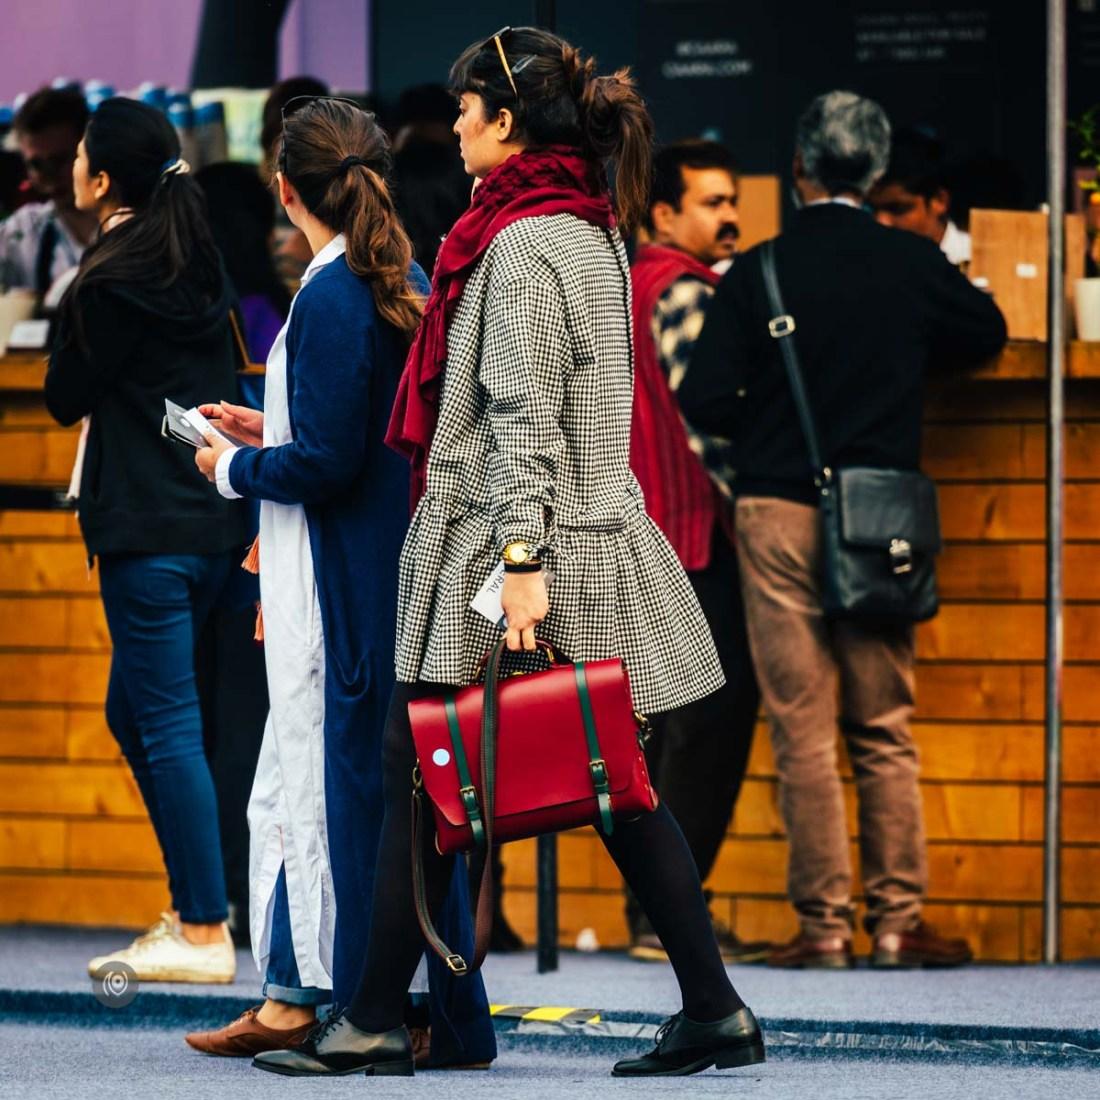 Experience Collector, Lifestyle, Lifestyle Blogger, Lifestyle Blogger India, Lifestyle Photographer India, Luxury Blogger, Luxury Blogger India, Luxury Brands, Luxury Photographer, Luxury Photographer India, Naina Redhu, Naina.co, Professional Photographer, Visual Storyteller, Visual Storyteller for Luxury Brands, Influencer, Luxury Influencer, Lifestyle Influencer, Photography Influencer, Brand Storyteller, Visual Storyteller, #EyesForStreetStyle, India, #EyesForIndia, Street Style in India, Street Style, Street Style Photographer, Street Style Photography, India Art Fair, #IndiaArtFair